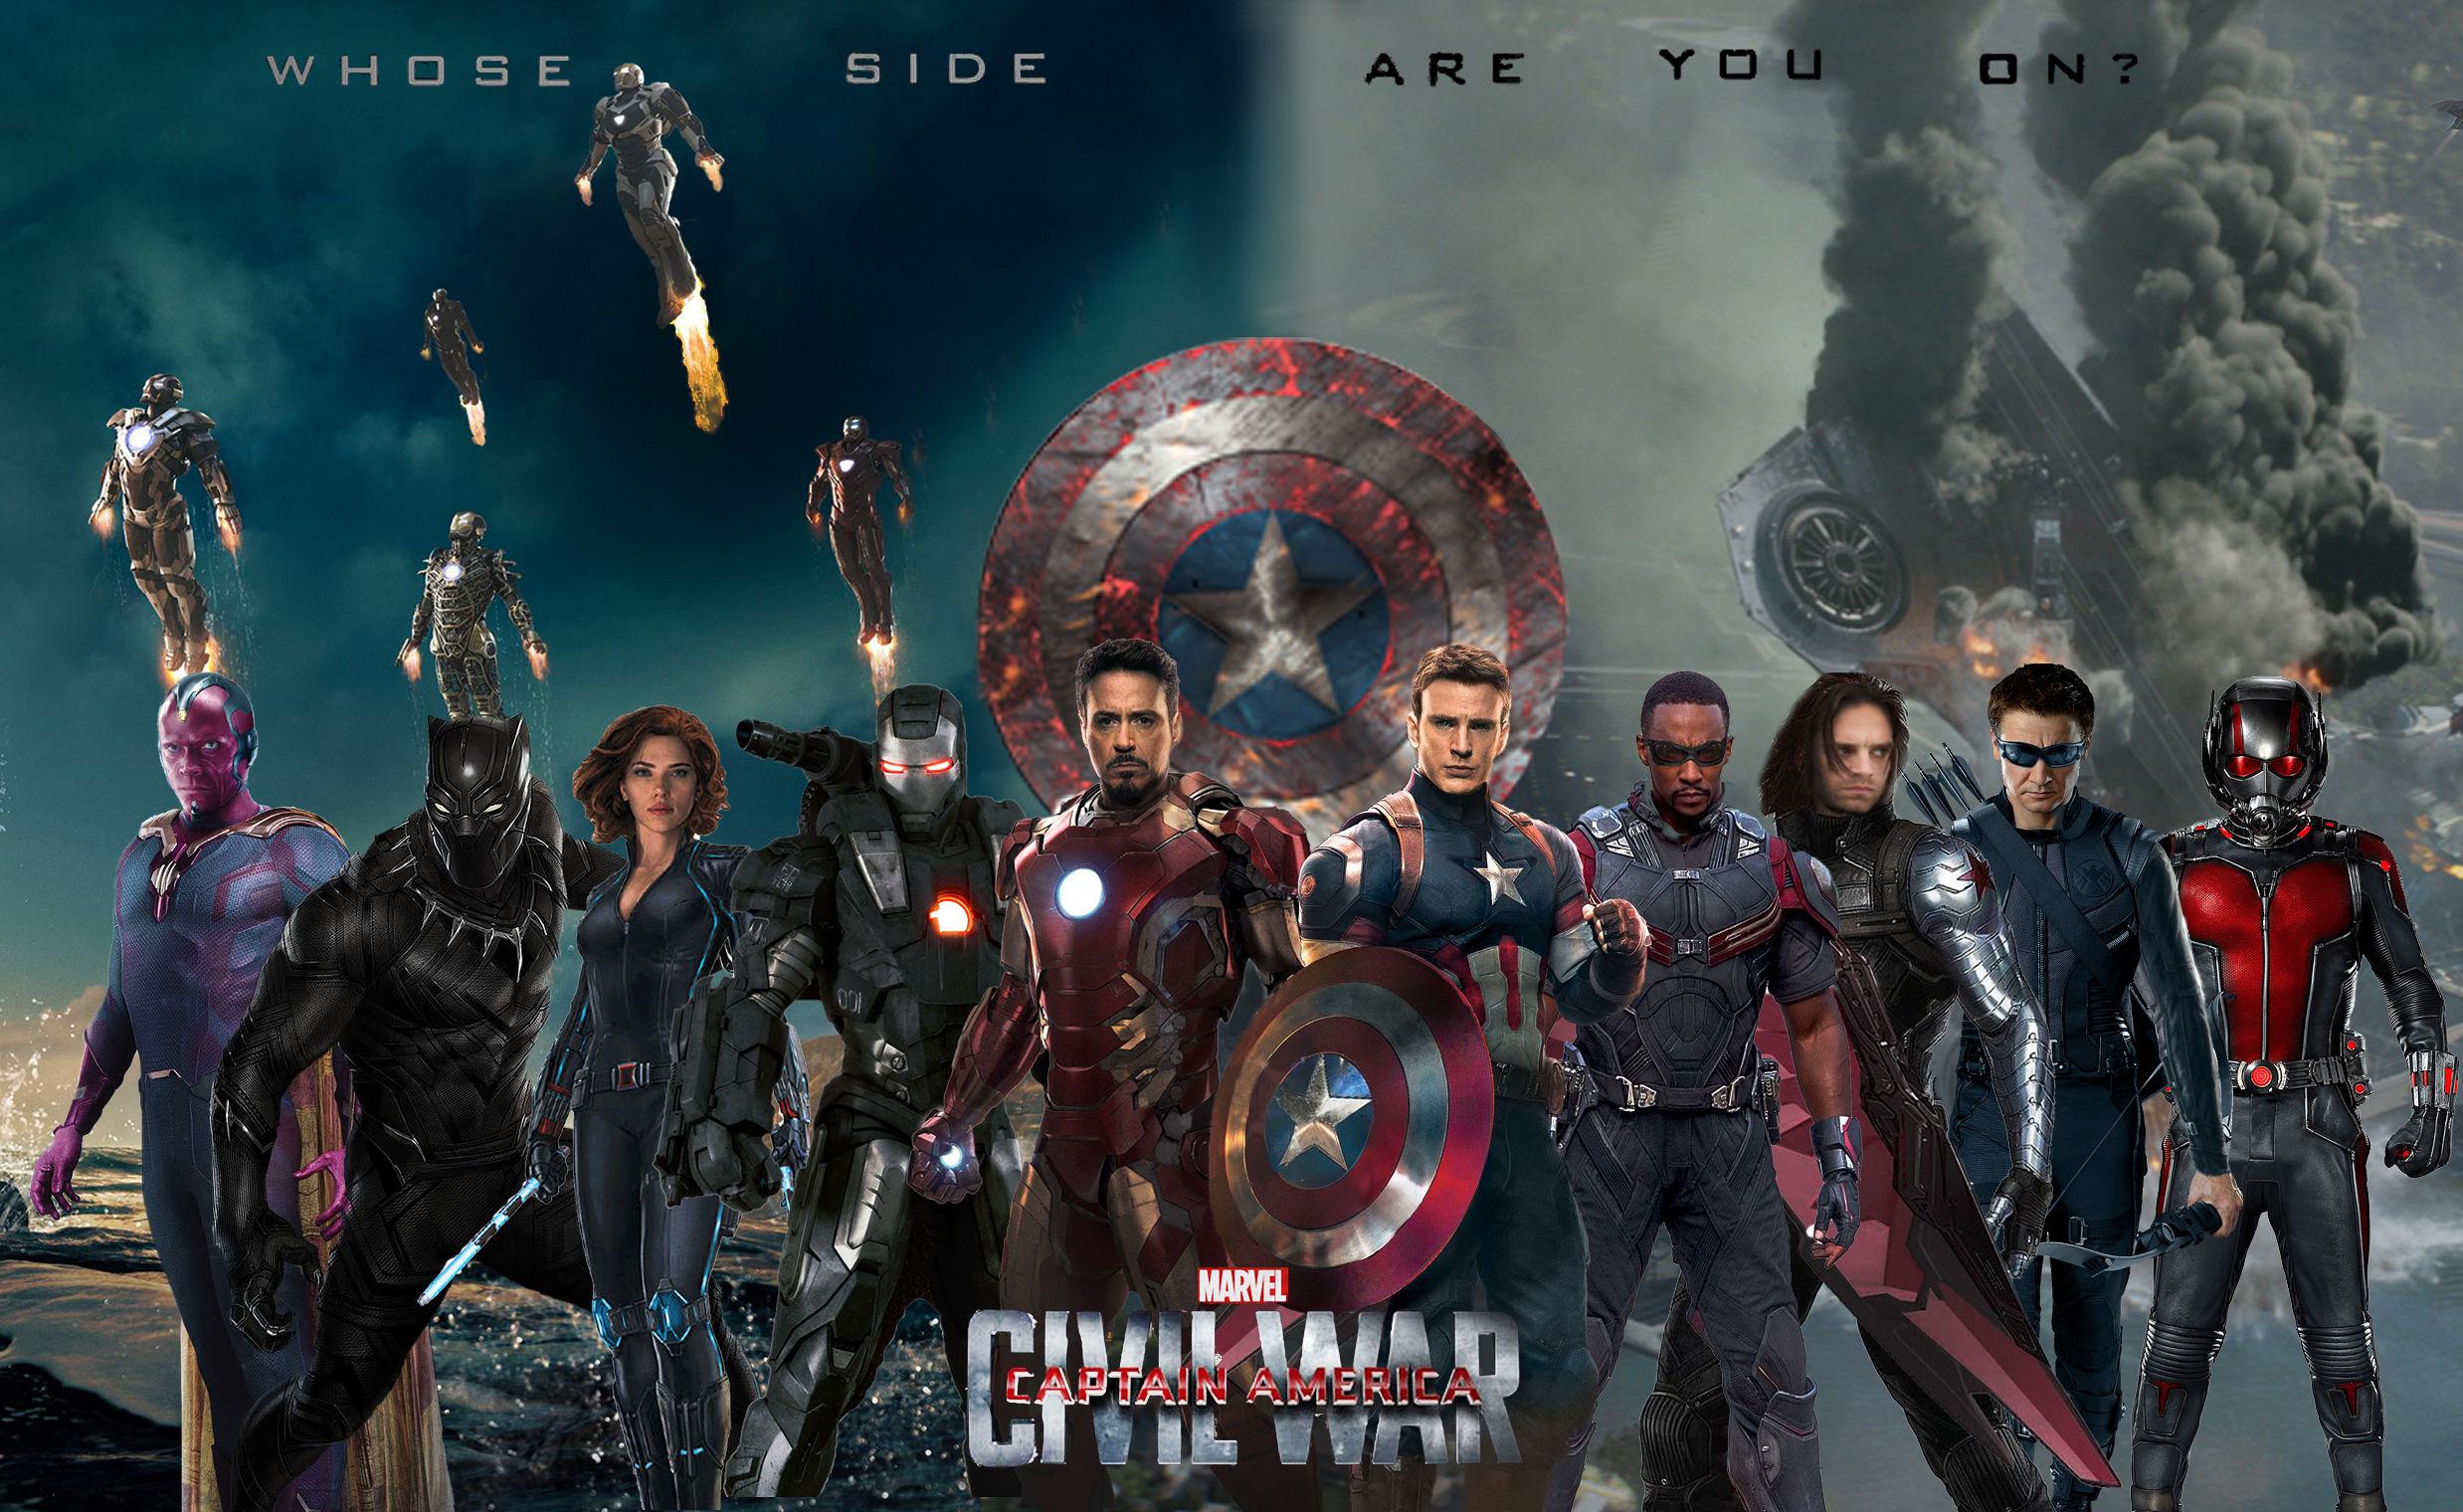 Captain America Civil War Wallpapermore   moviepilotcom 2476x1520